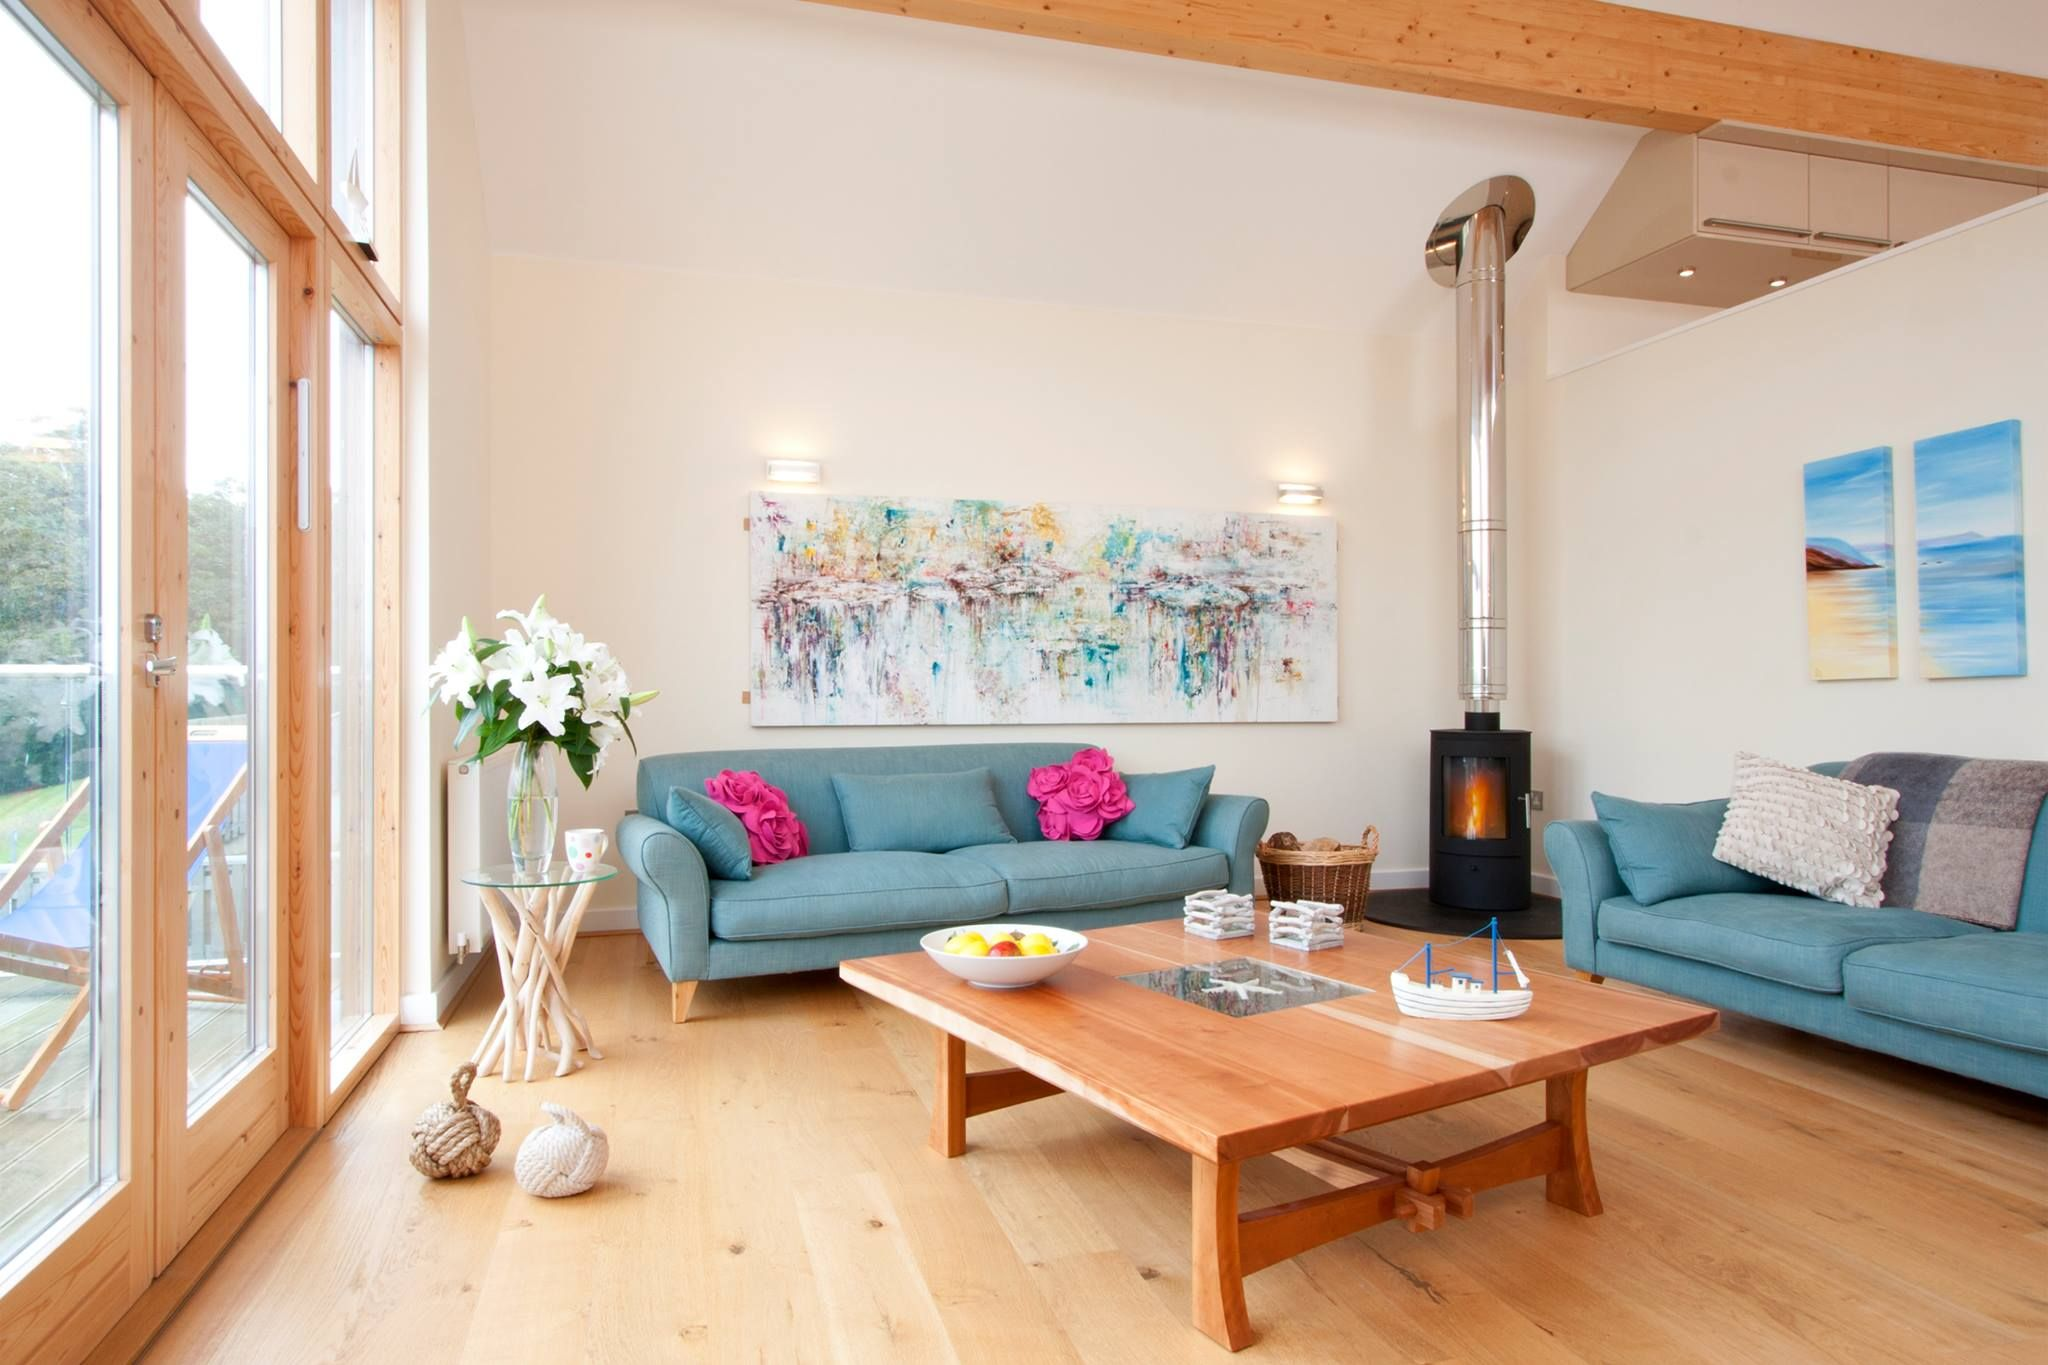 Fantastic The Bay Talland Bay Looe Cornwall England Holiday Download Free Architecture Designs Remcamadebymaigaardcom